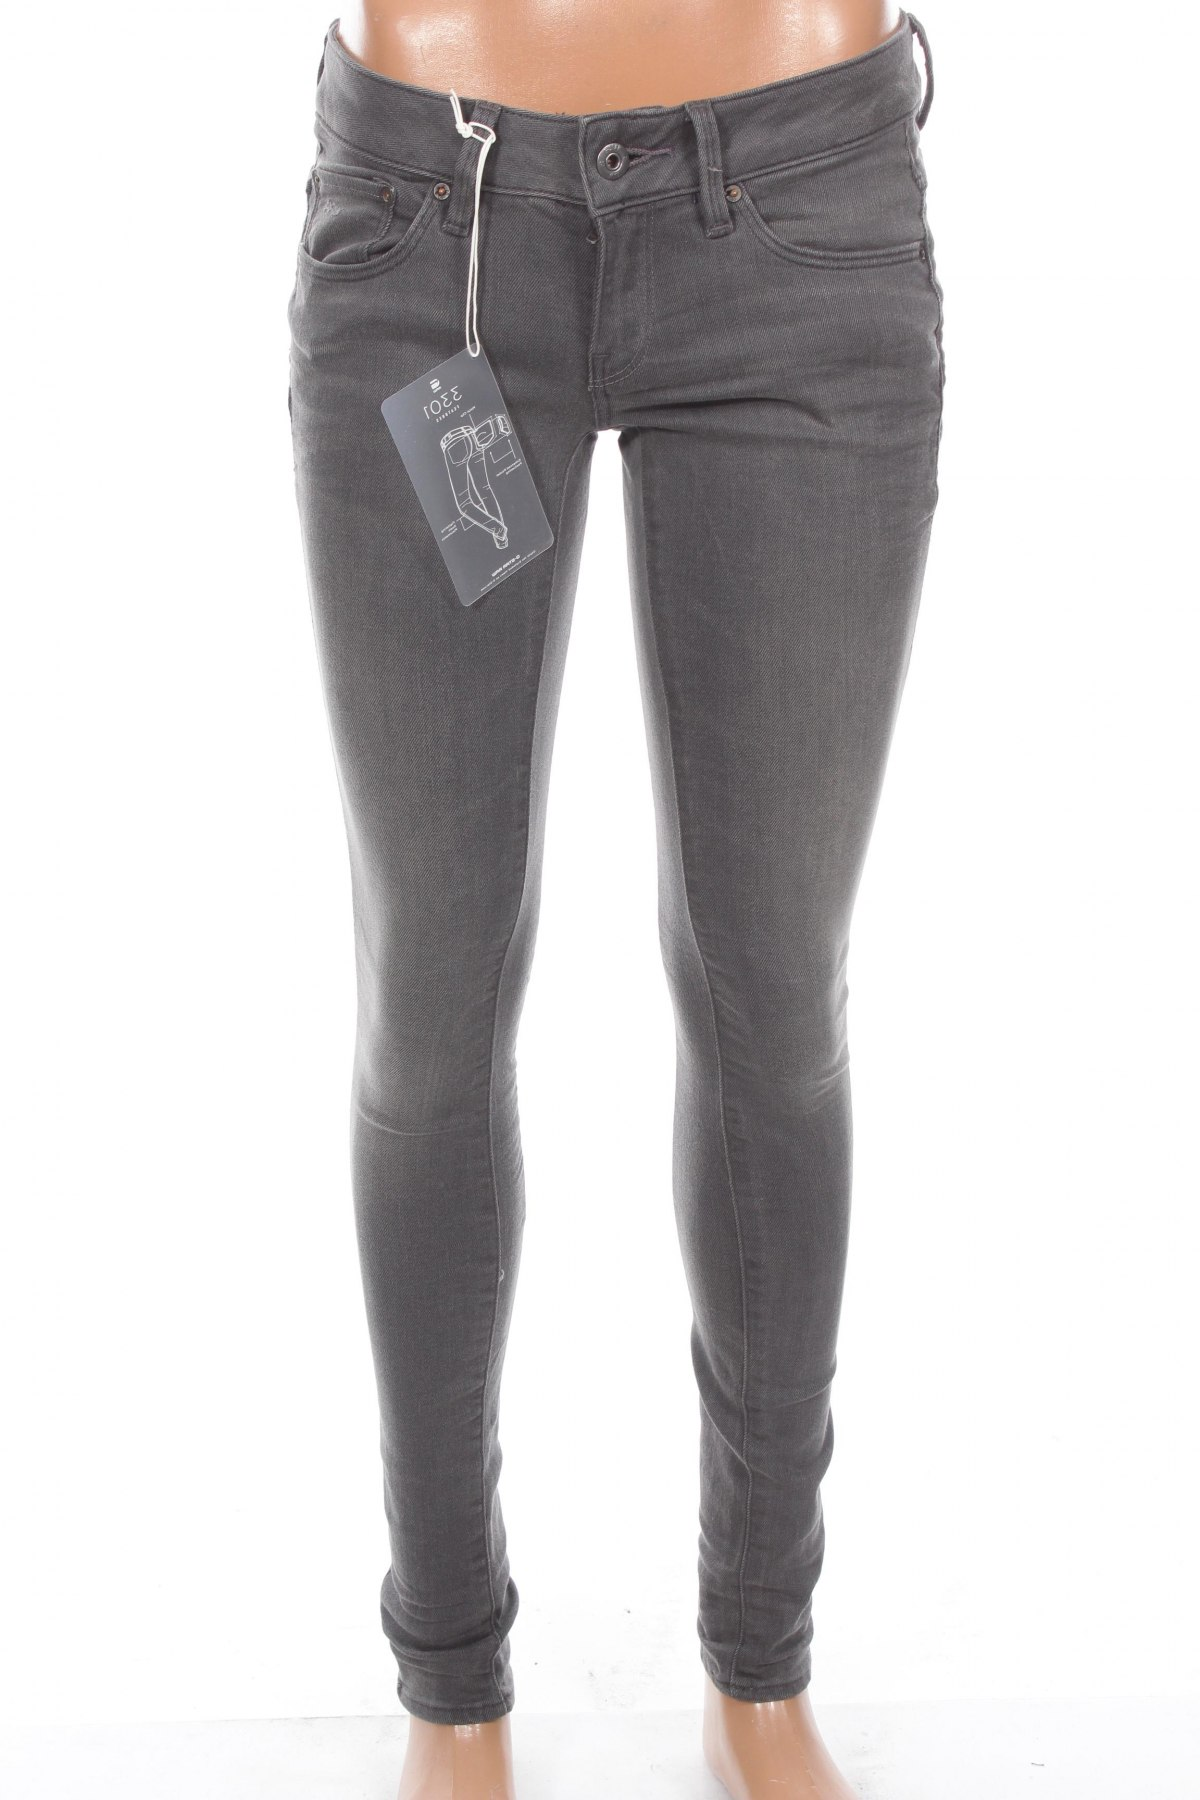 women 39 s jeans g star raw 8459553 remix. Black Bedroom Furniture Sets. Home Design Ideas